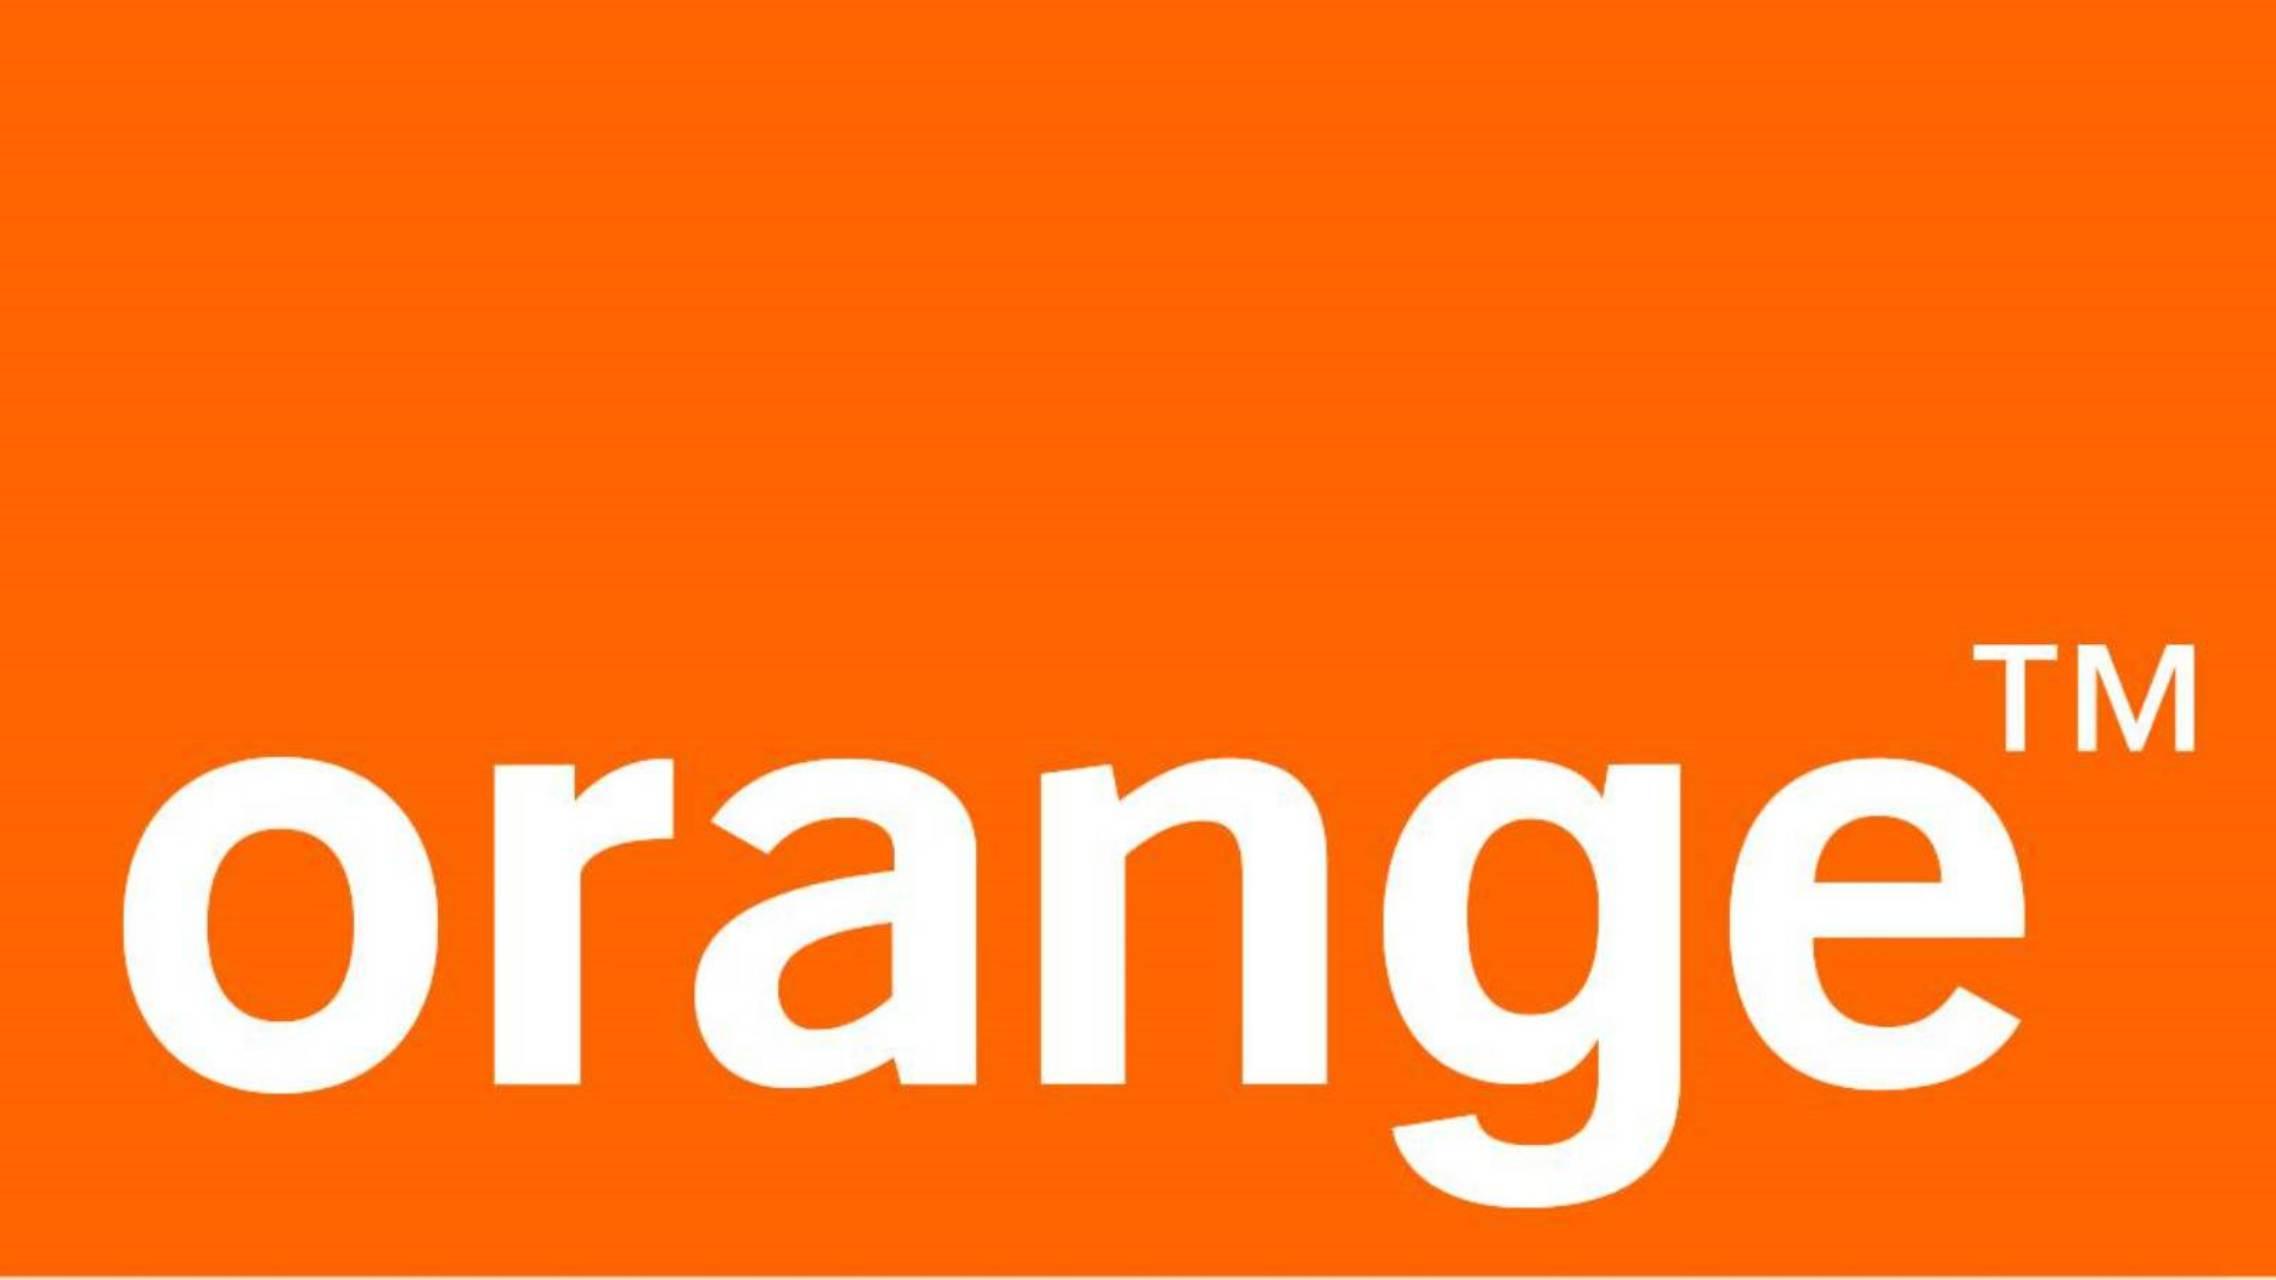 Orange COLOSALA